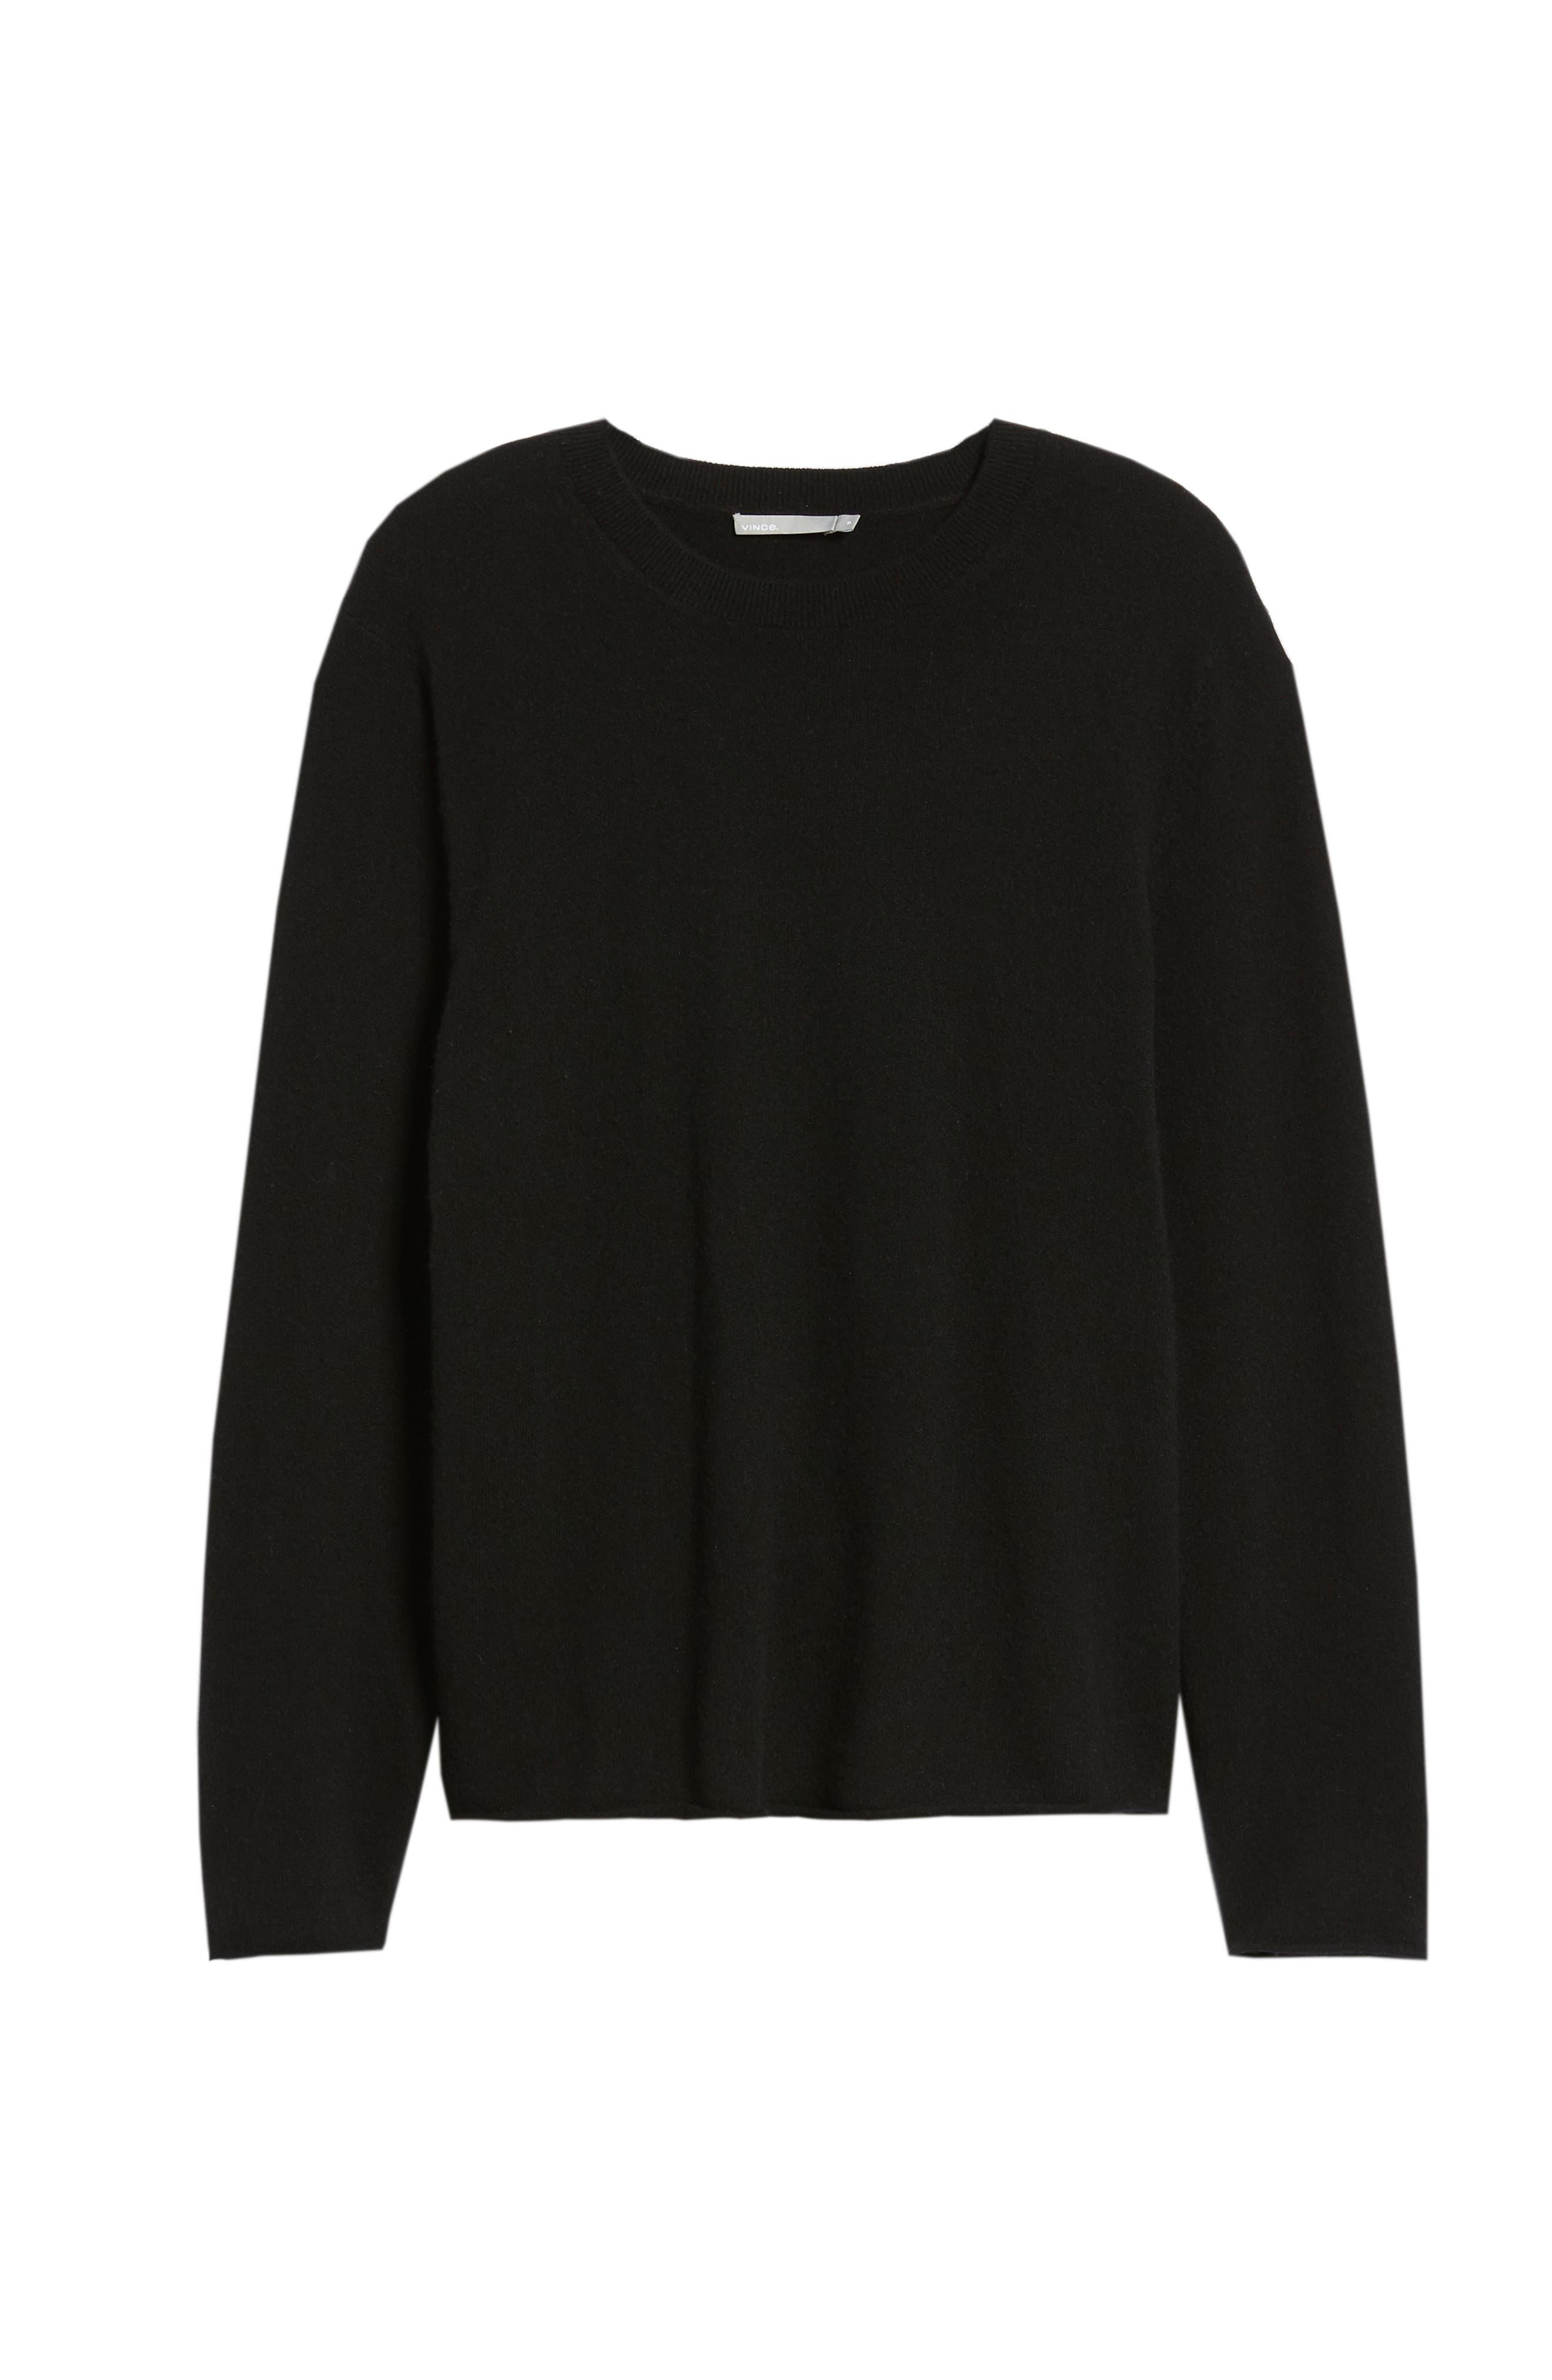 Regular Fit Cashmere Sweater,                             Alternate thumbnail 6, color,                             BLACK